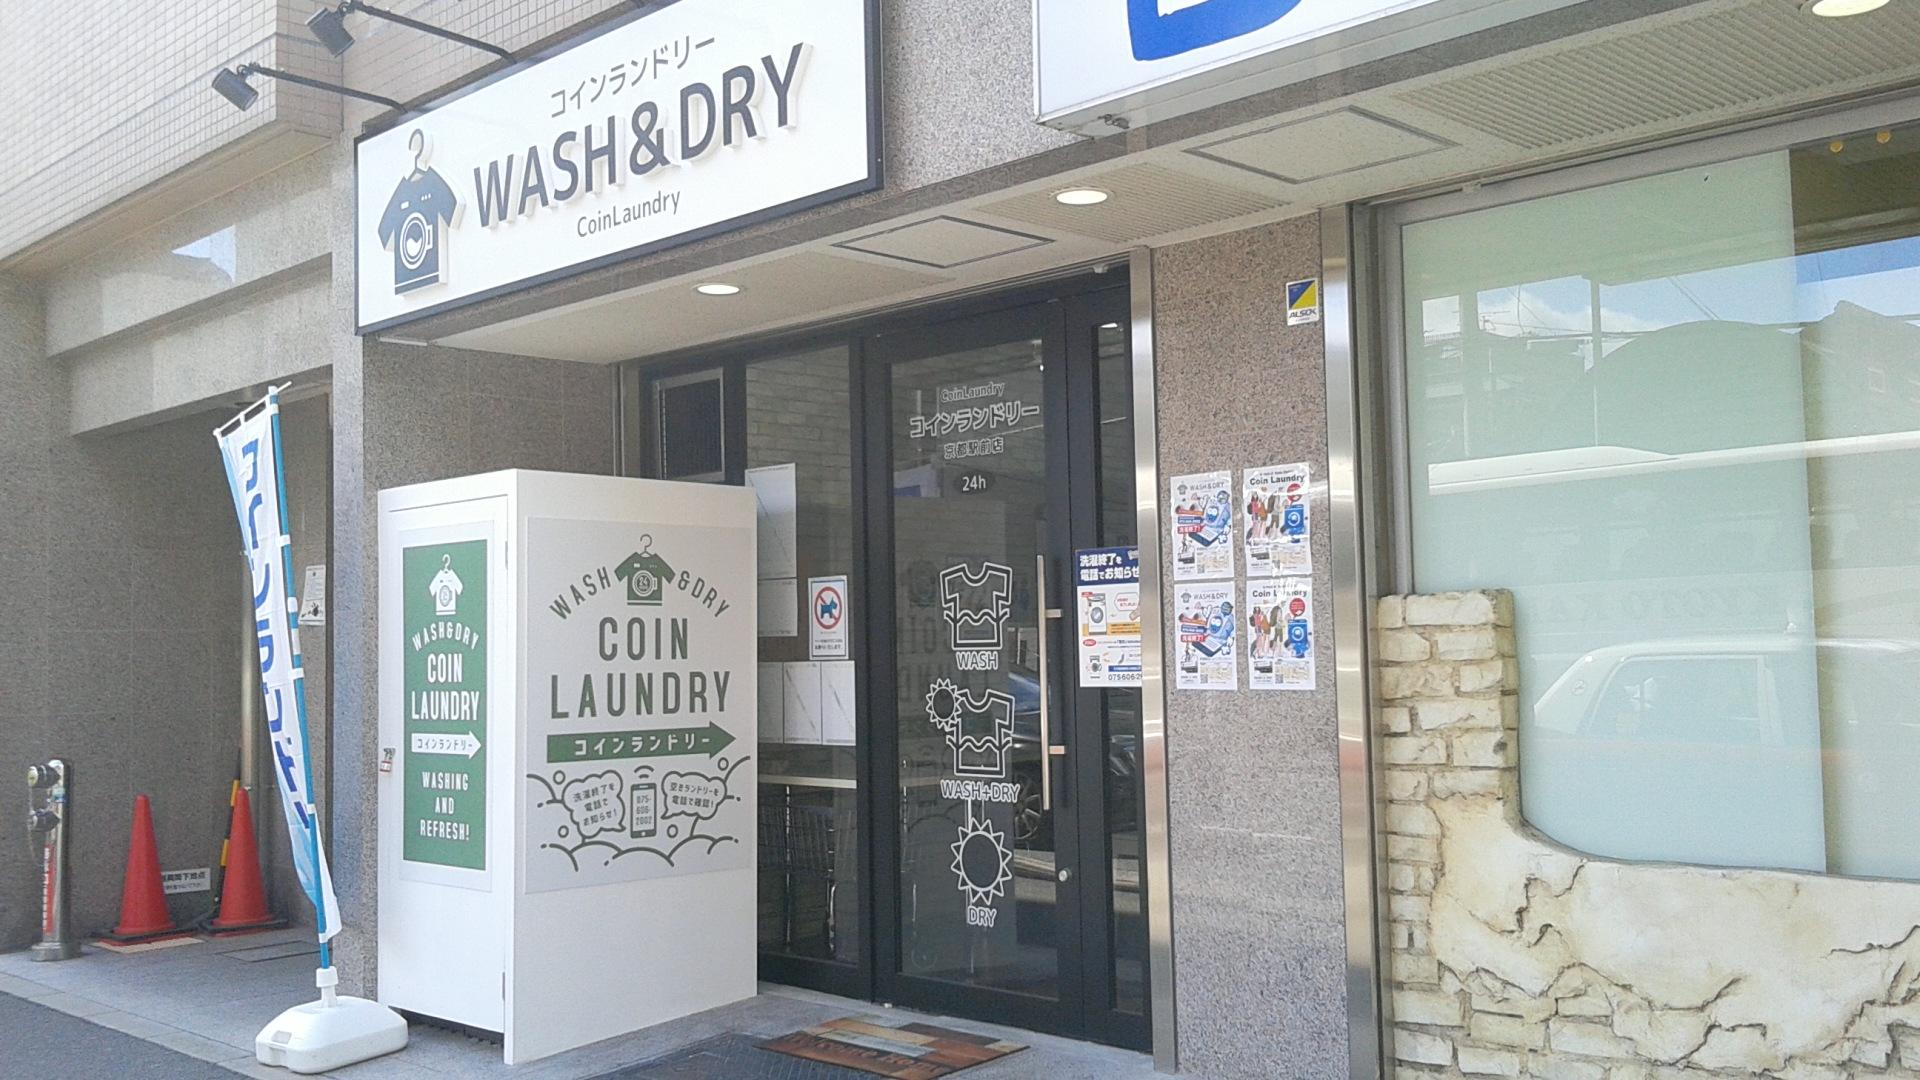 WASH&DRY 京都駅前店